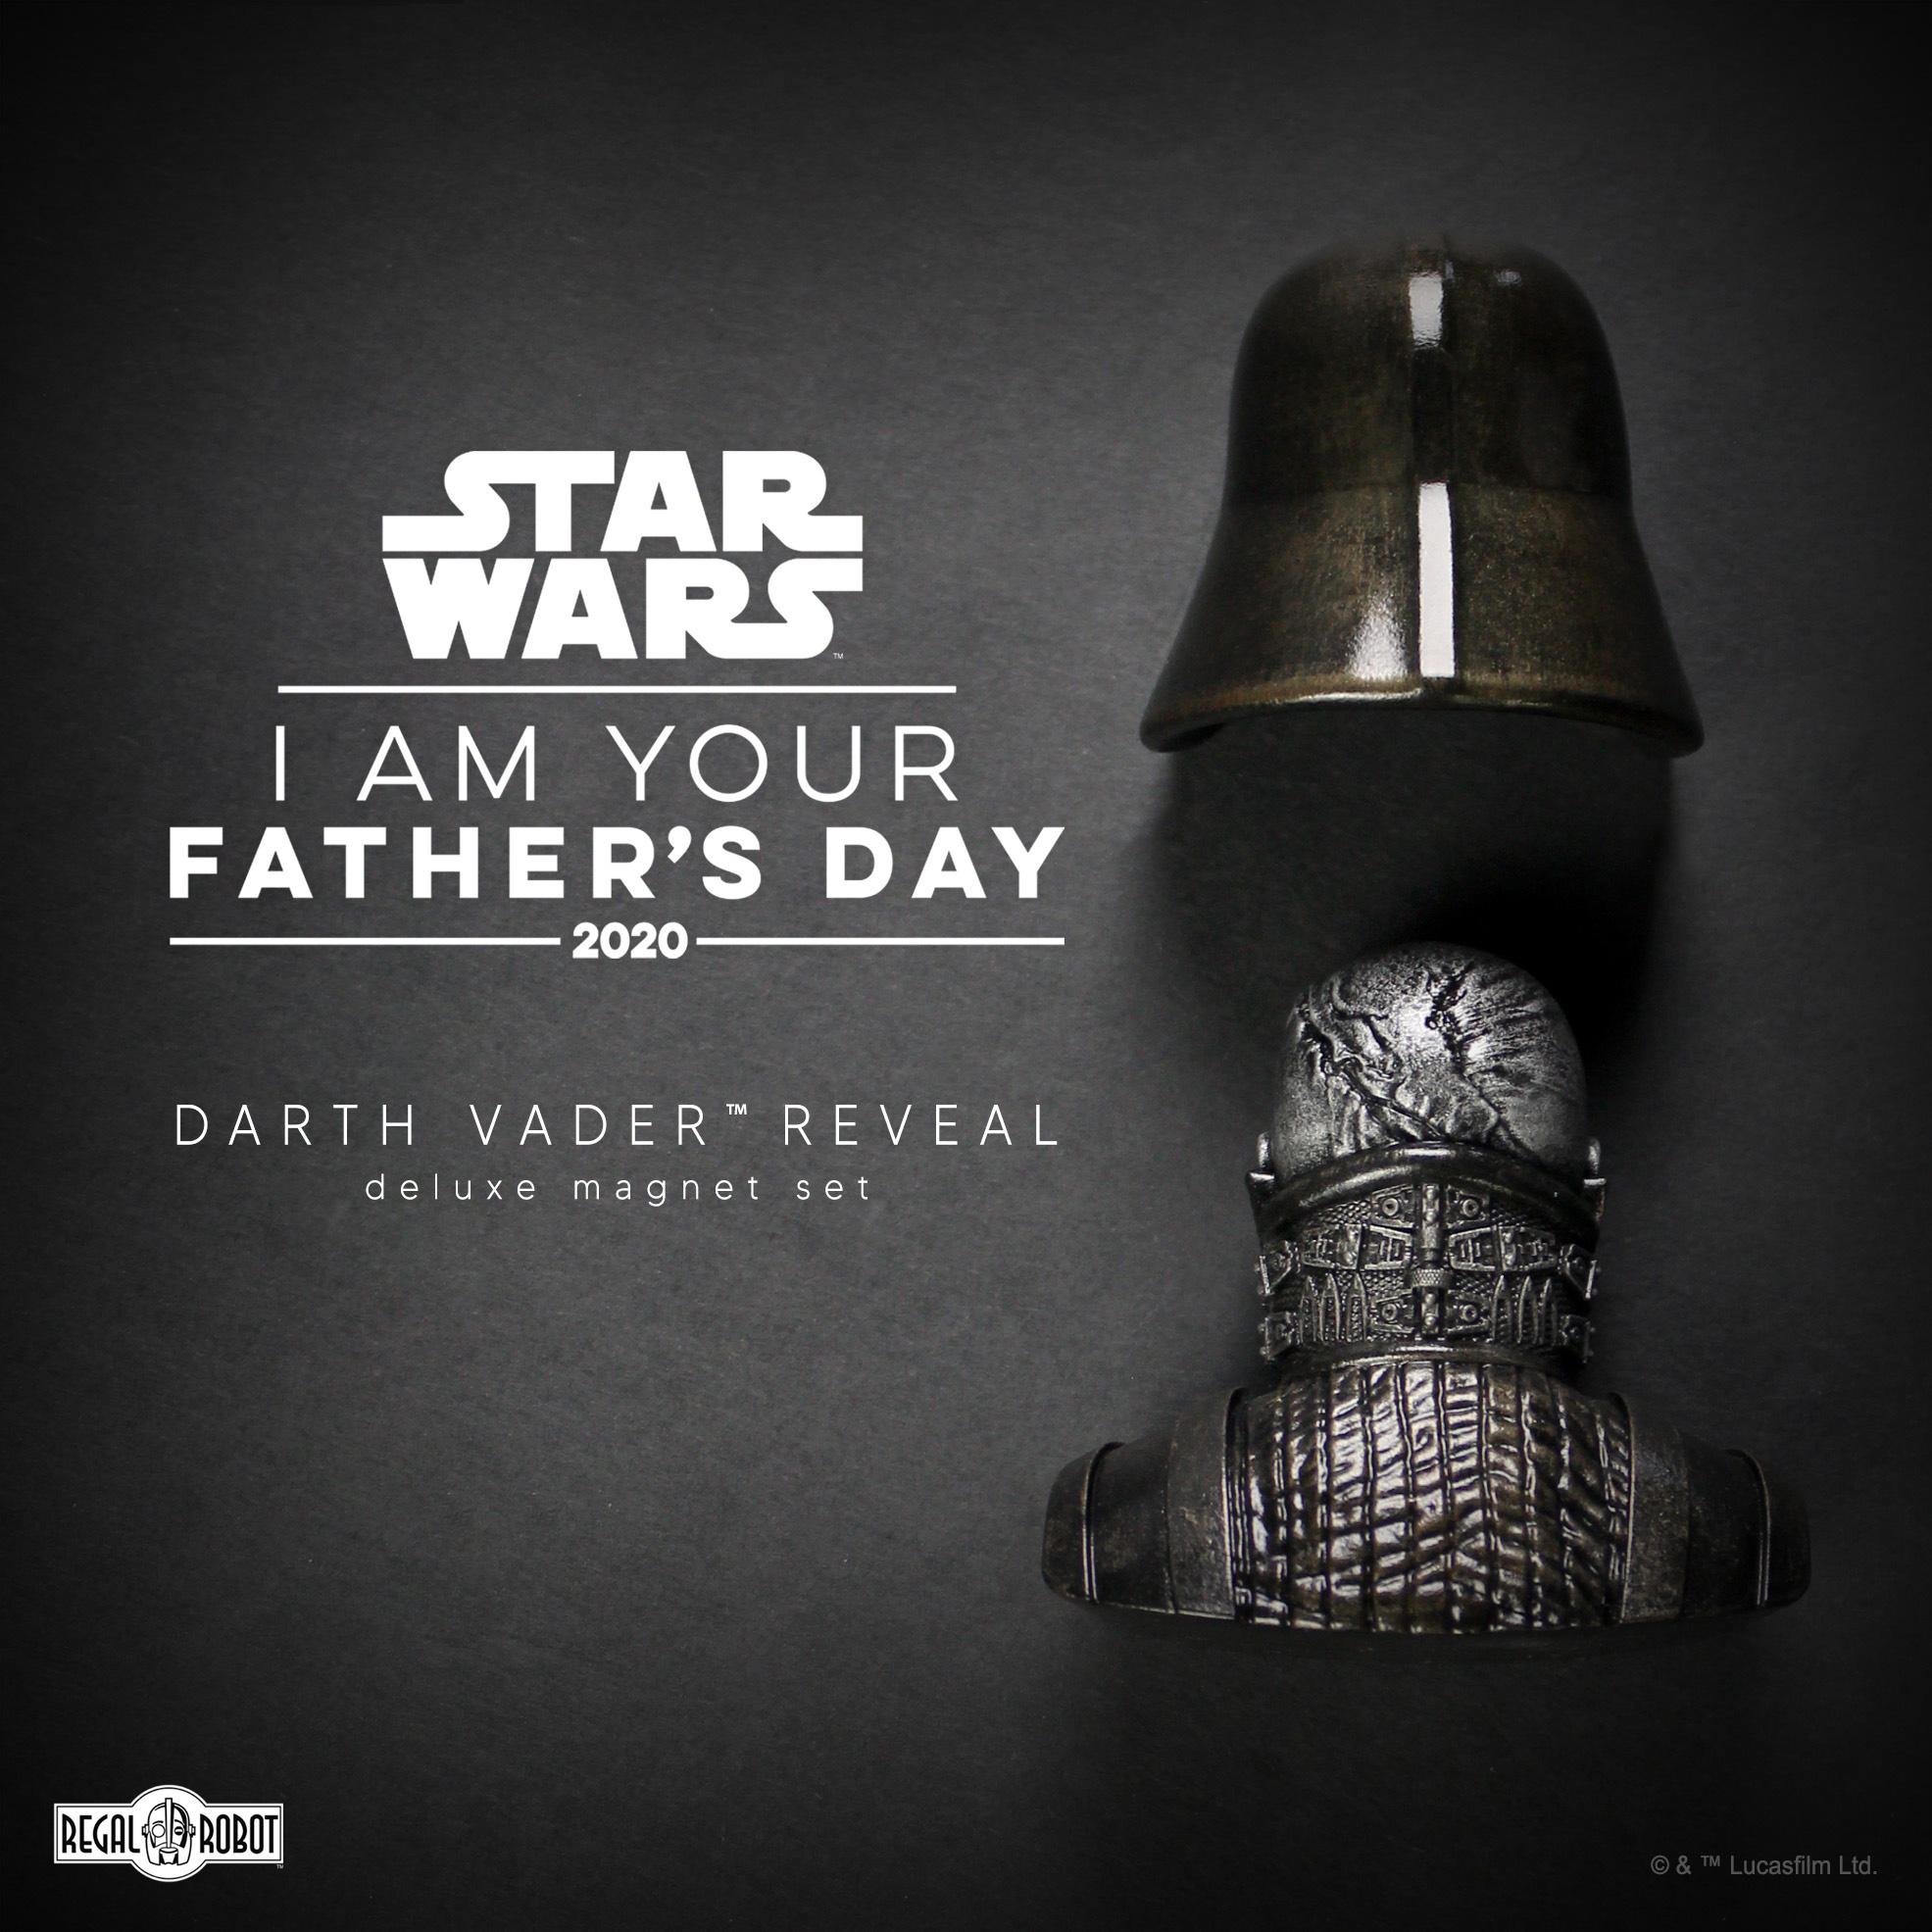 Star Wars sculpture magnets